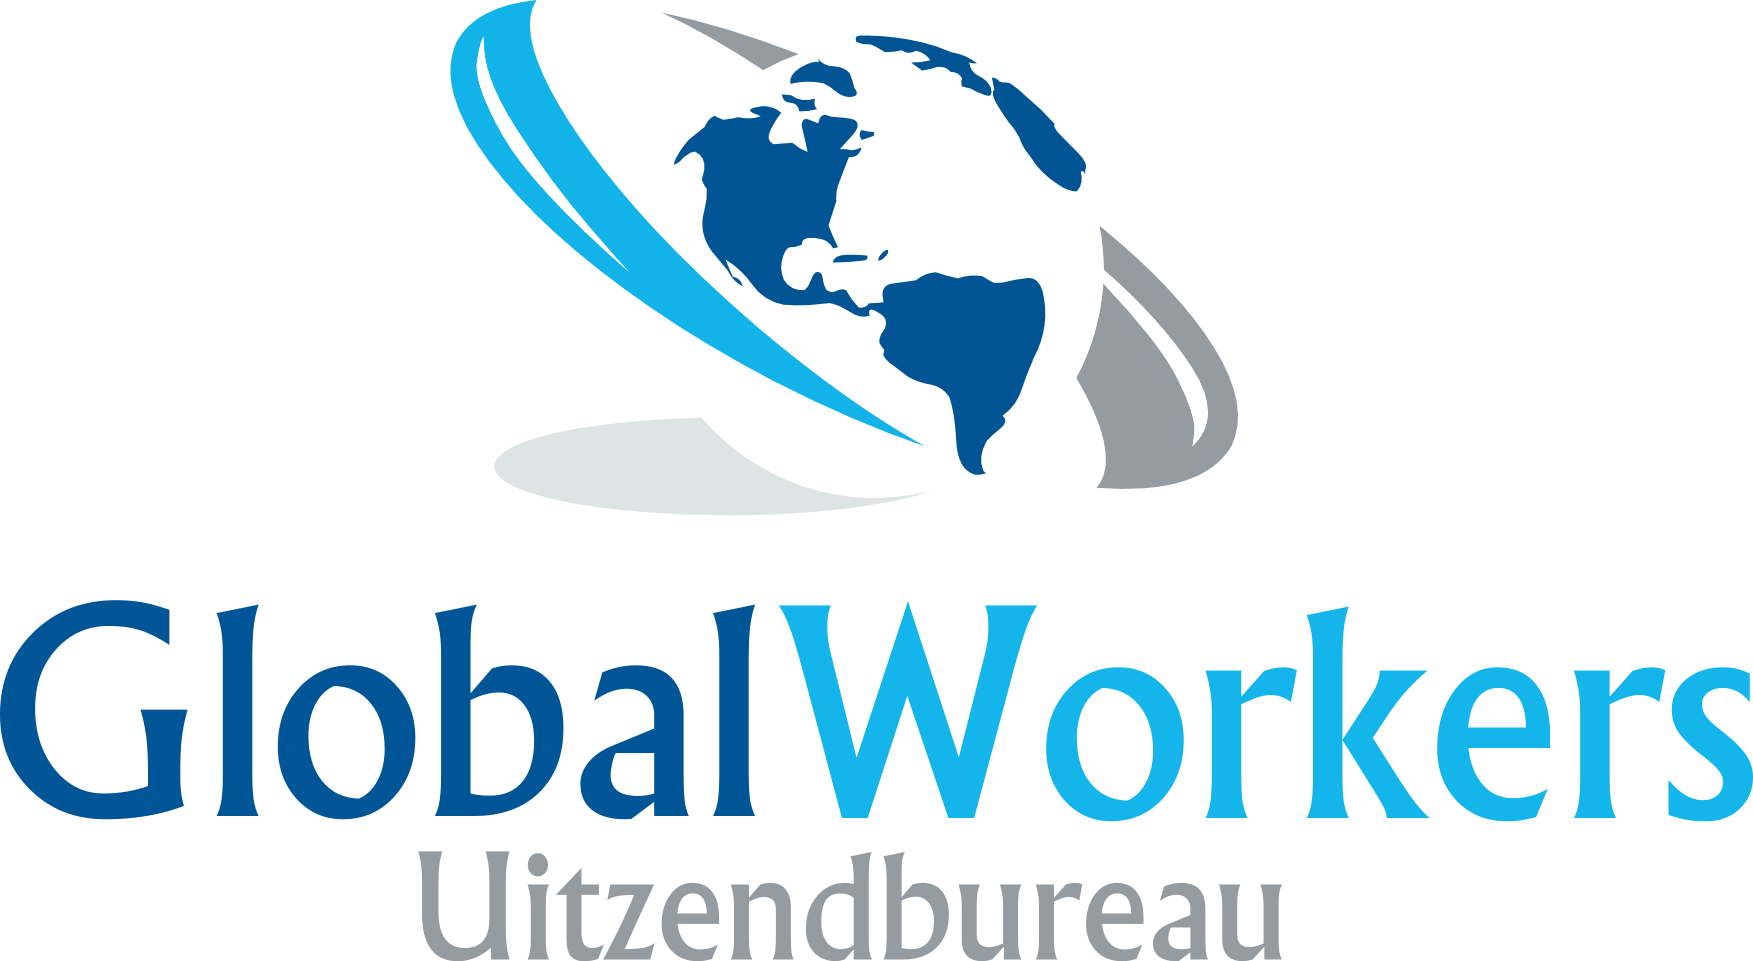 Globalworkers